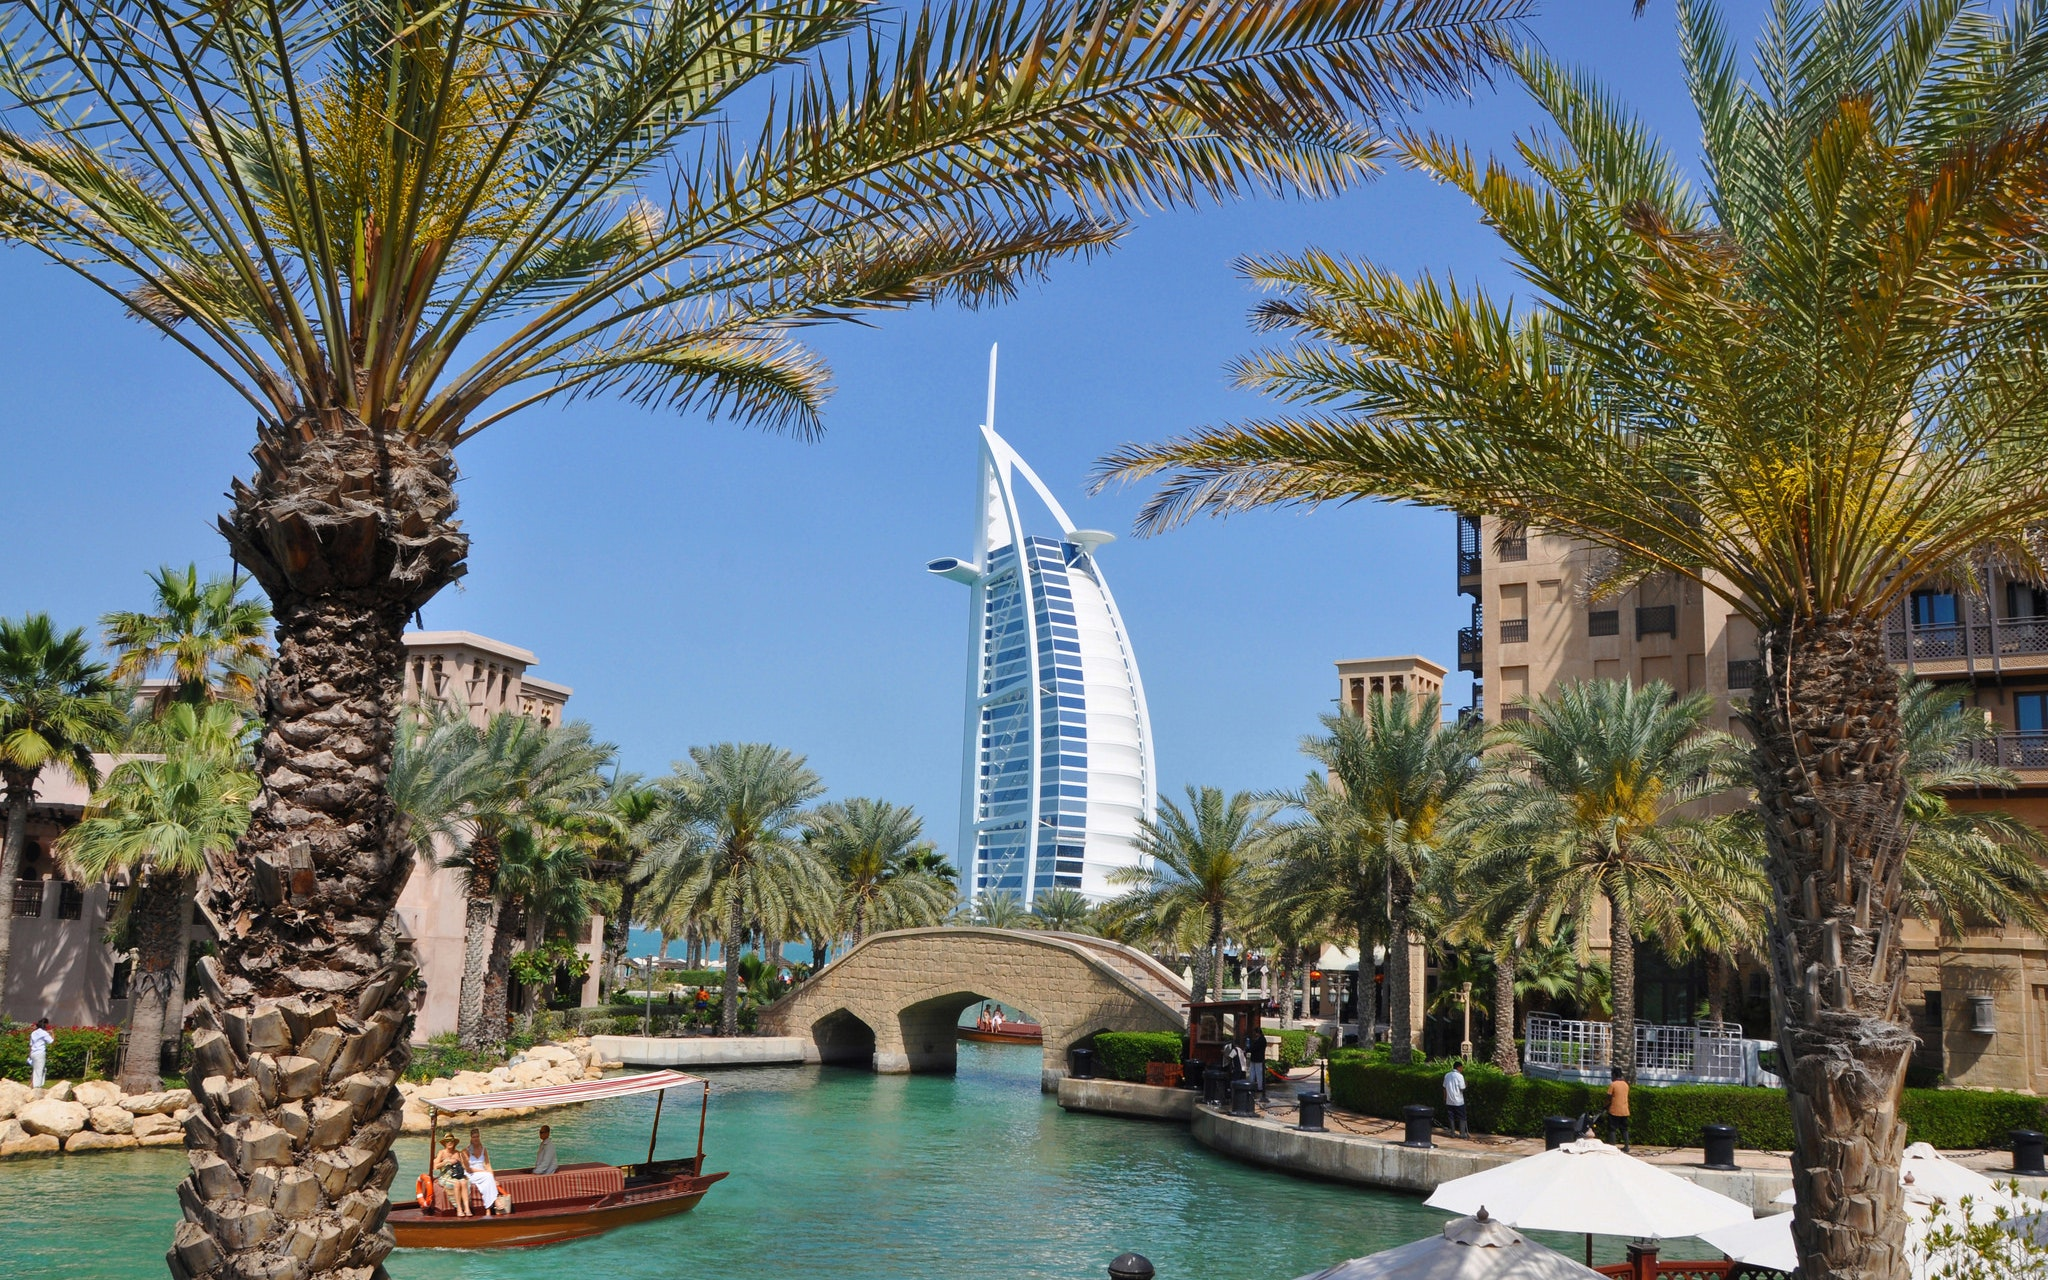 places-to-visit-in-dubai-burj-al-arab